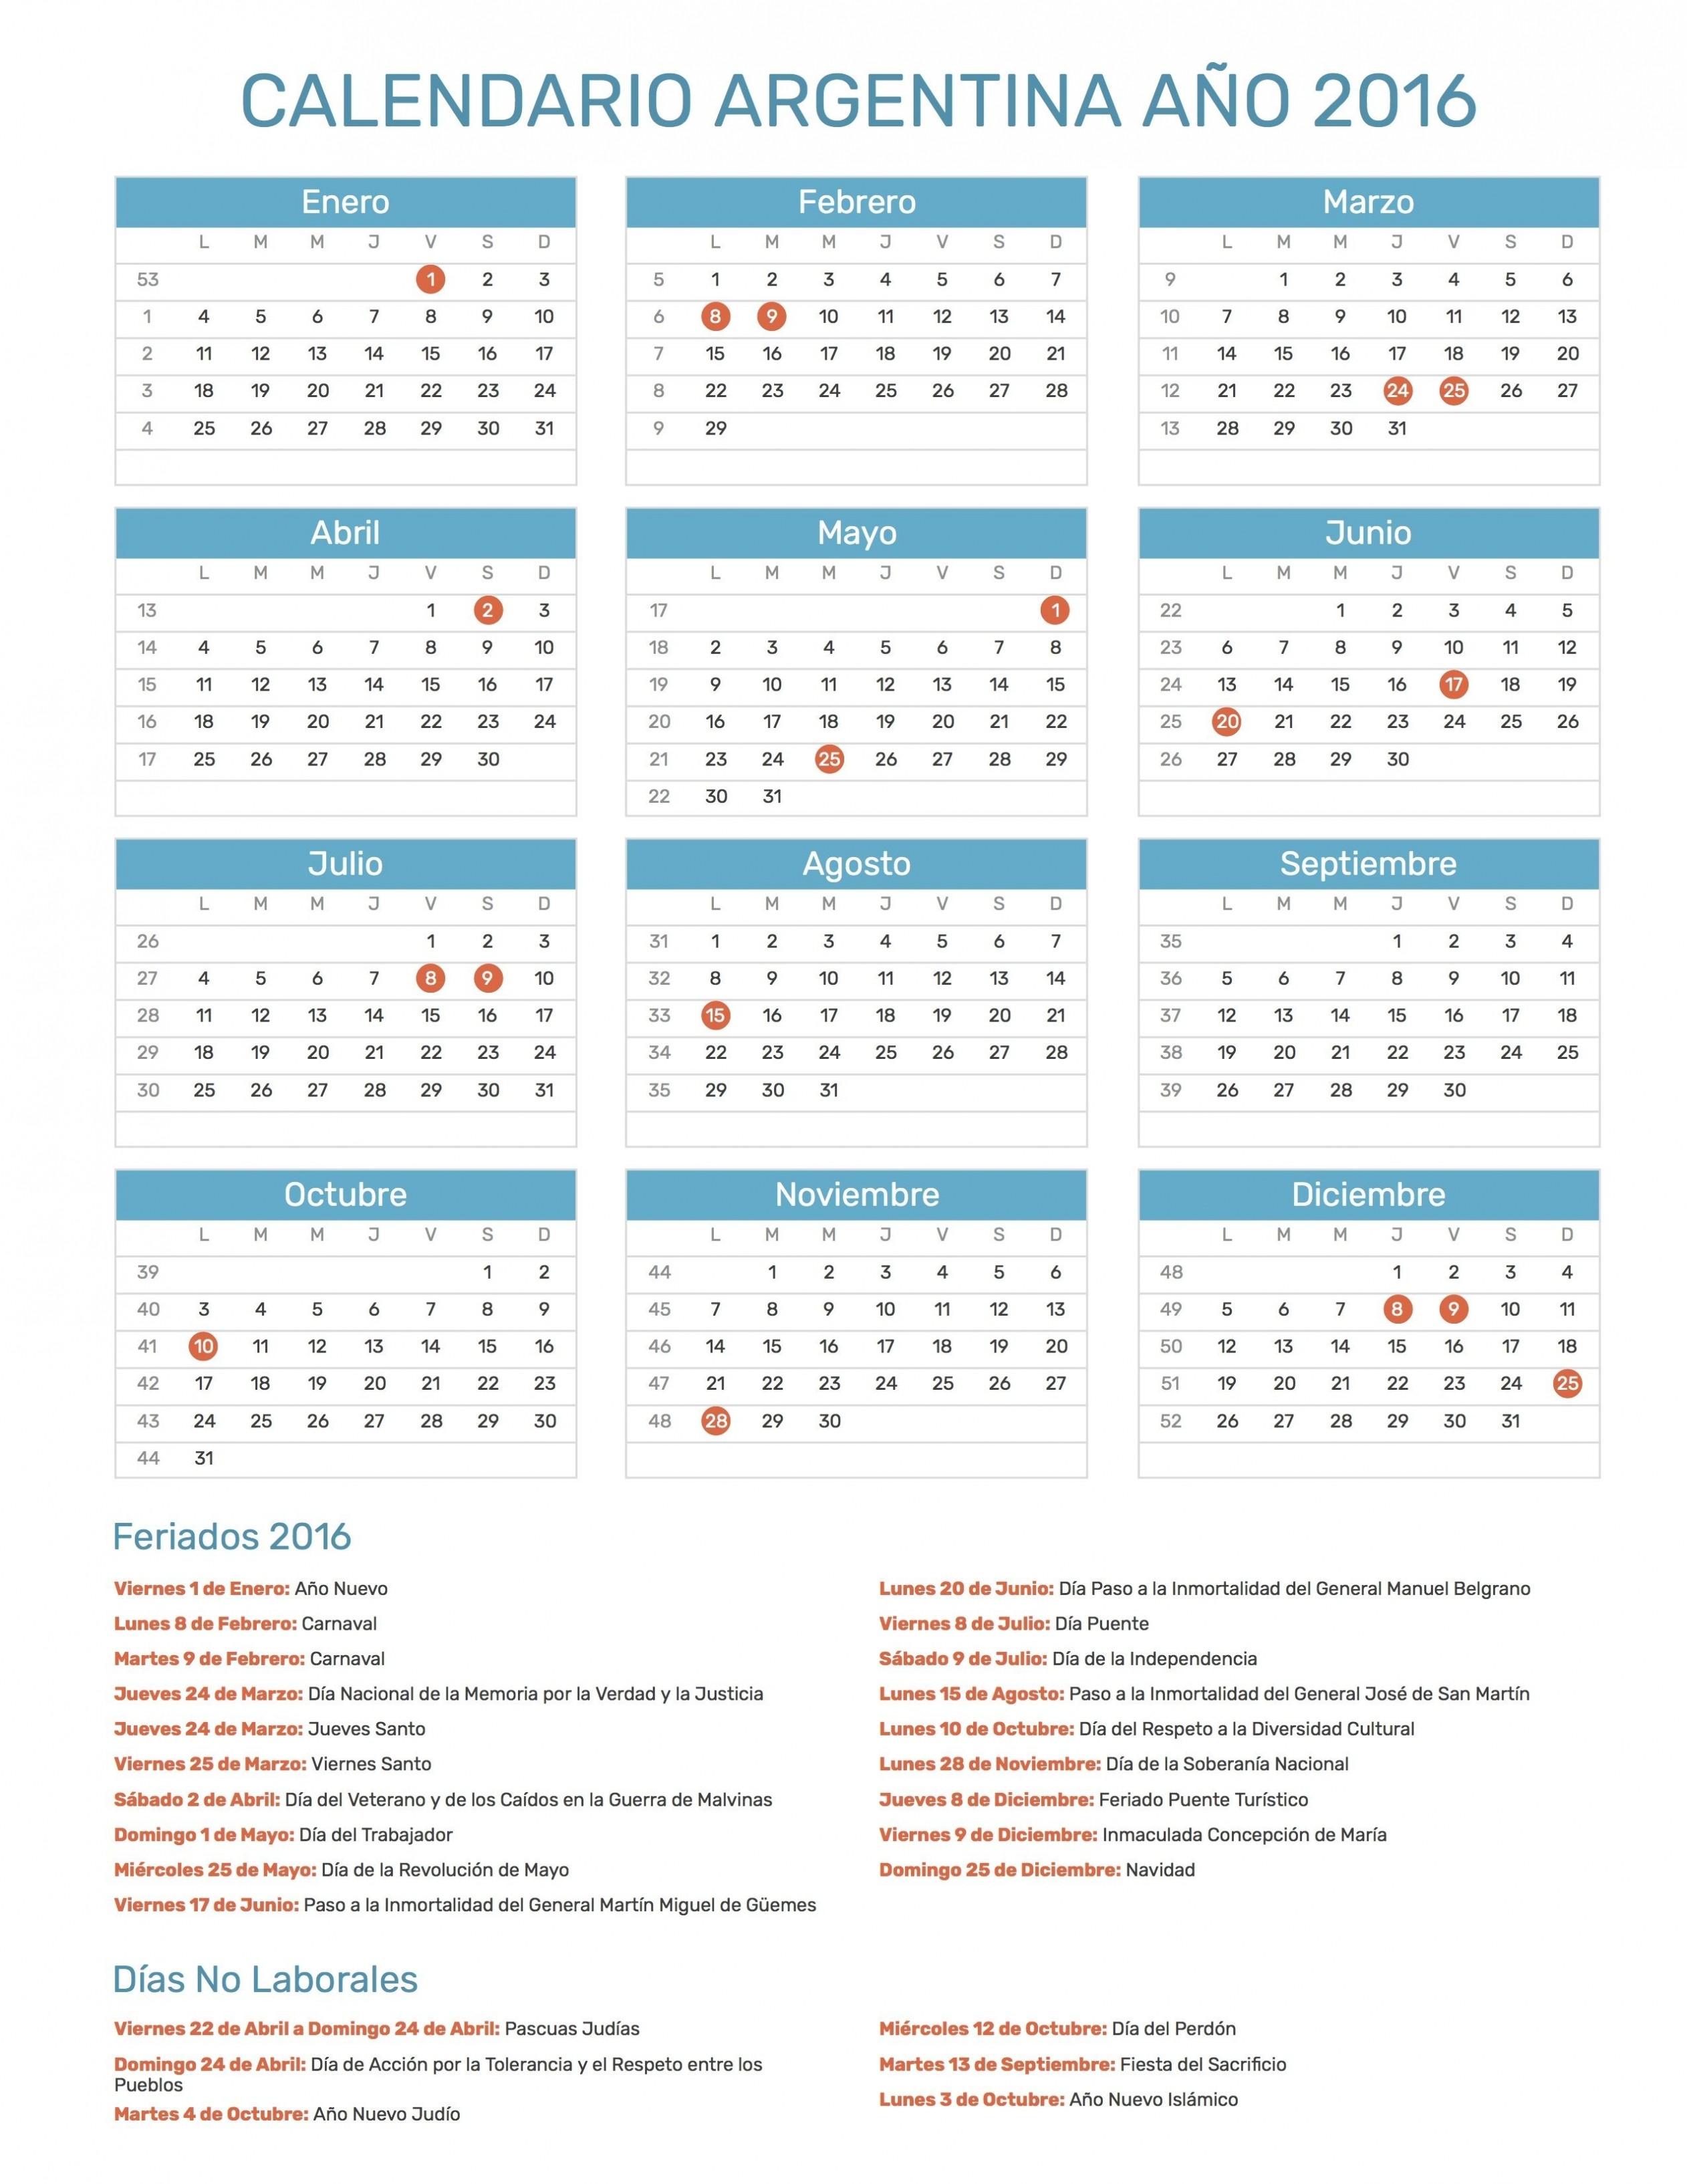 Image de Calendario De Argentina Con Feriados Nacionales A±o 2016 Incluye – Calendario